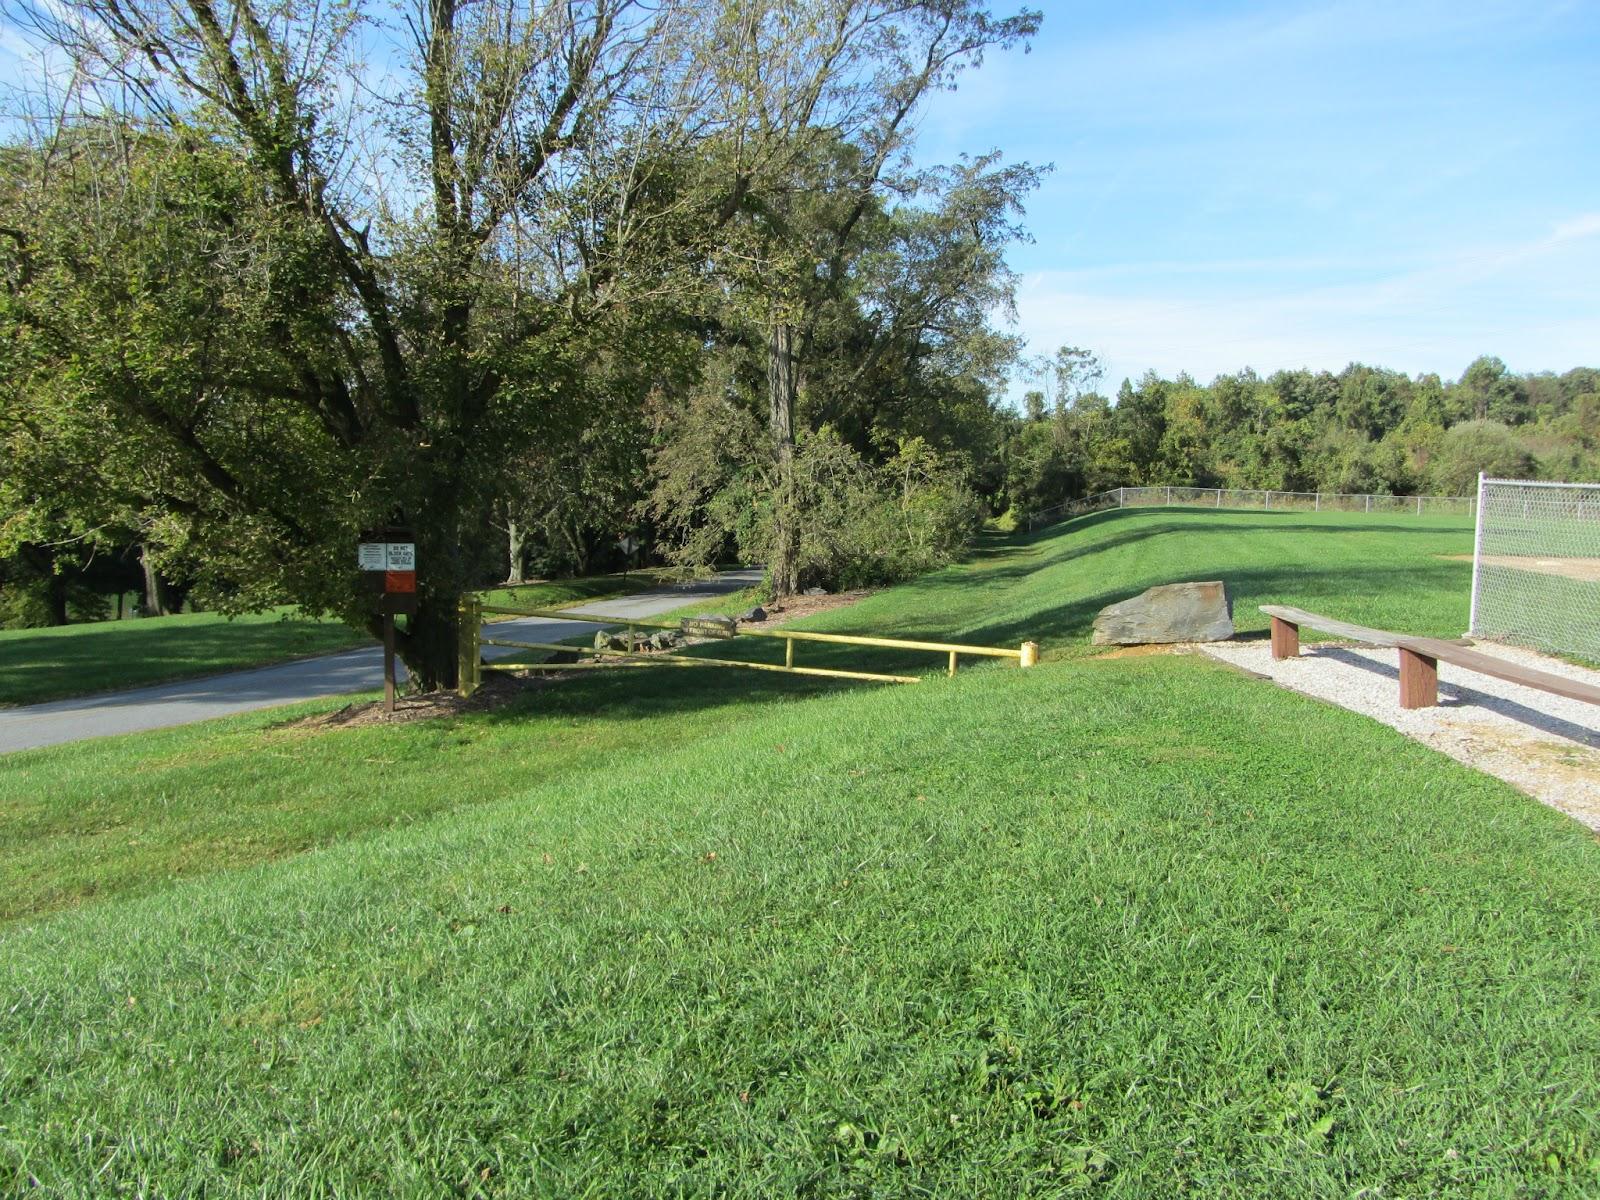 The start of Kelly's Run Trail near the baseball diamond